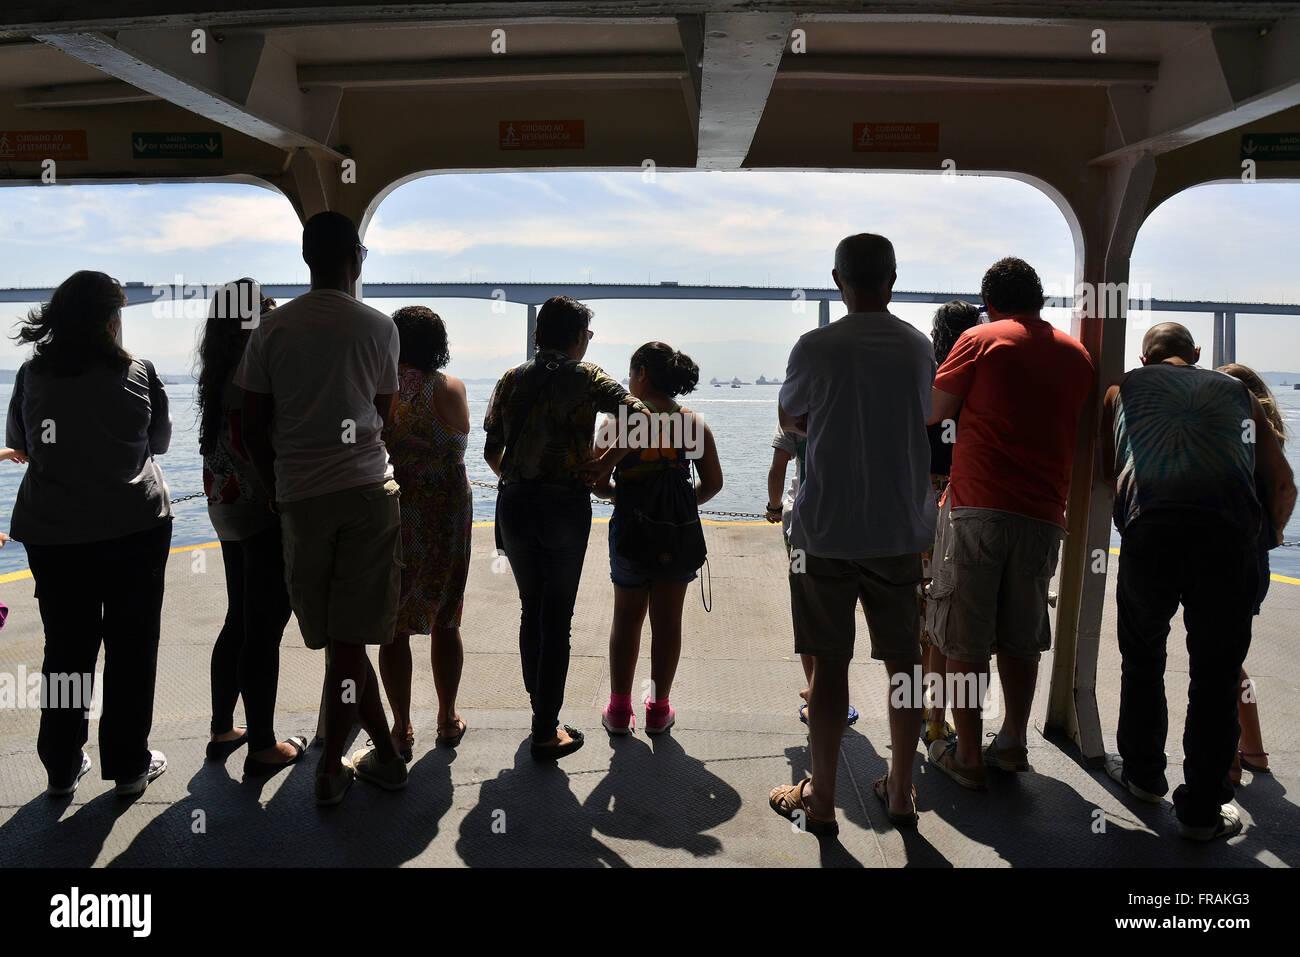 Passengers observing the Rio-Niteroi Bridge Boat ride in Guanabara Bay - Stock Image